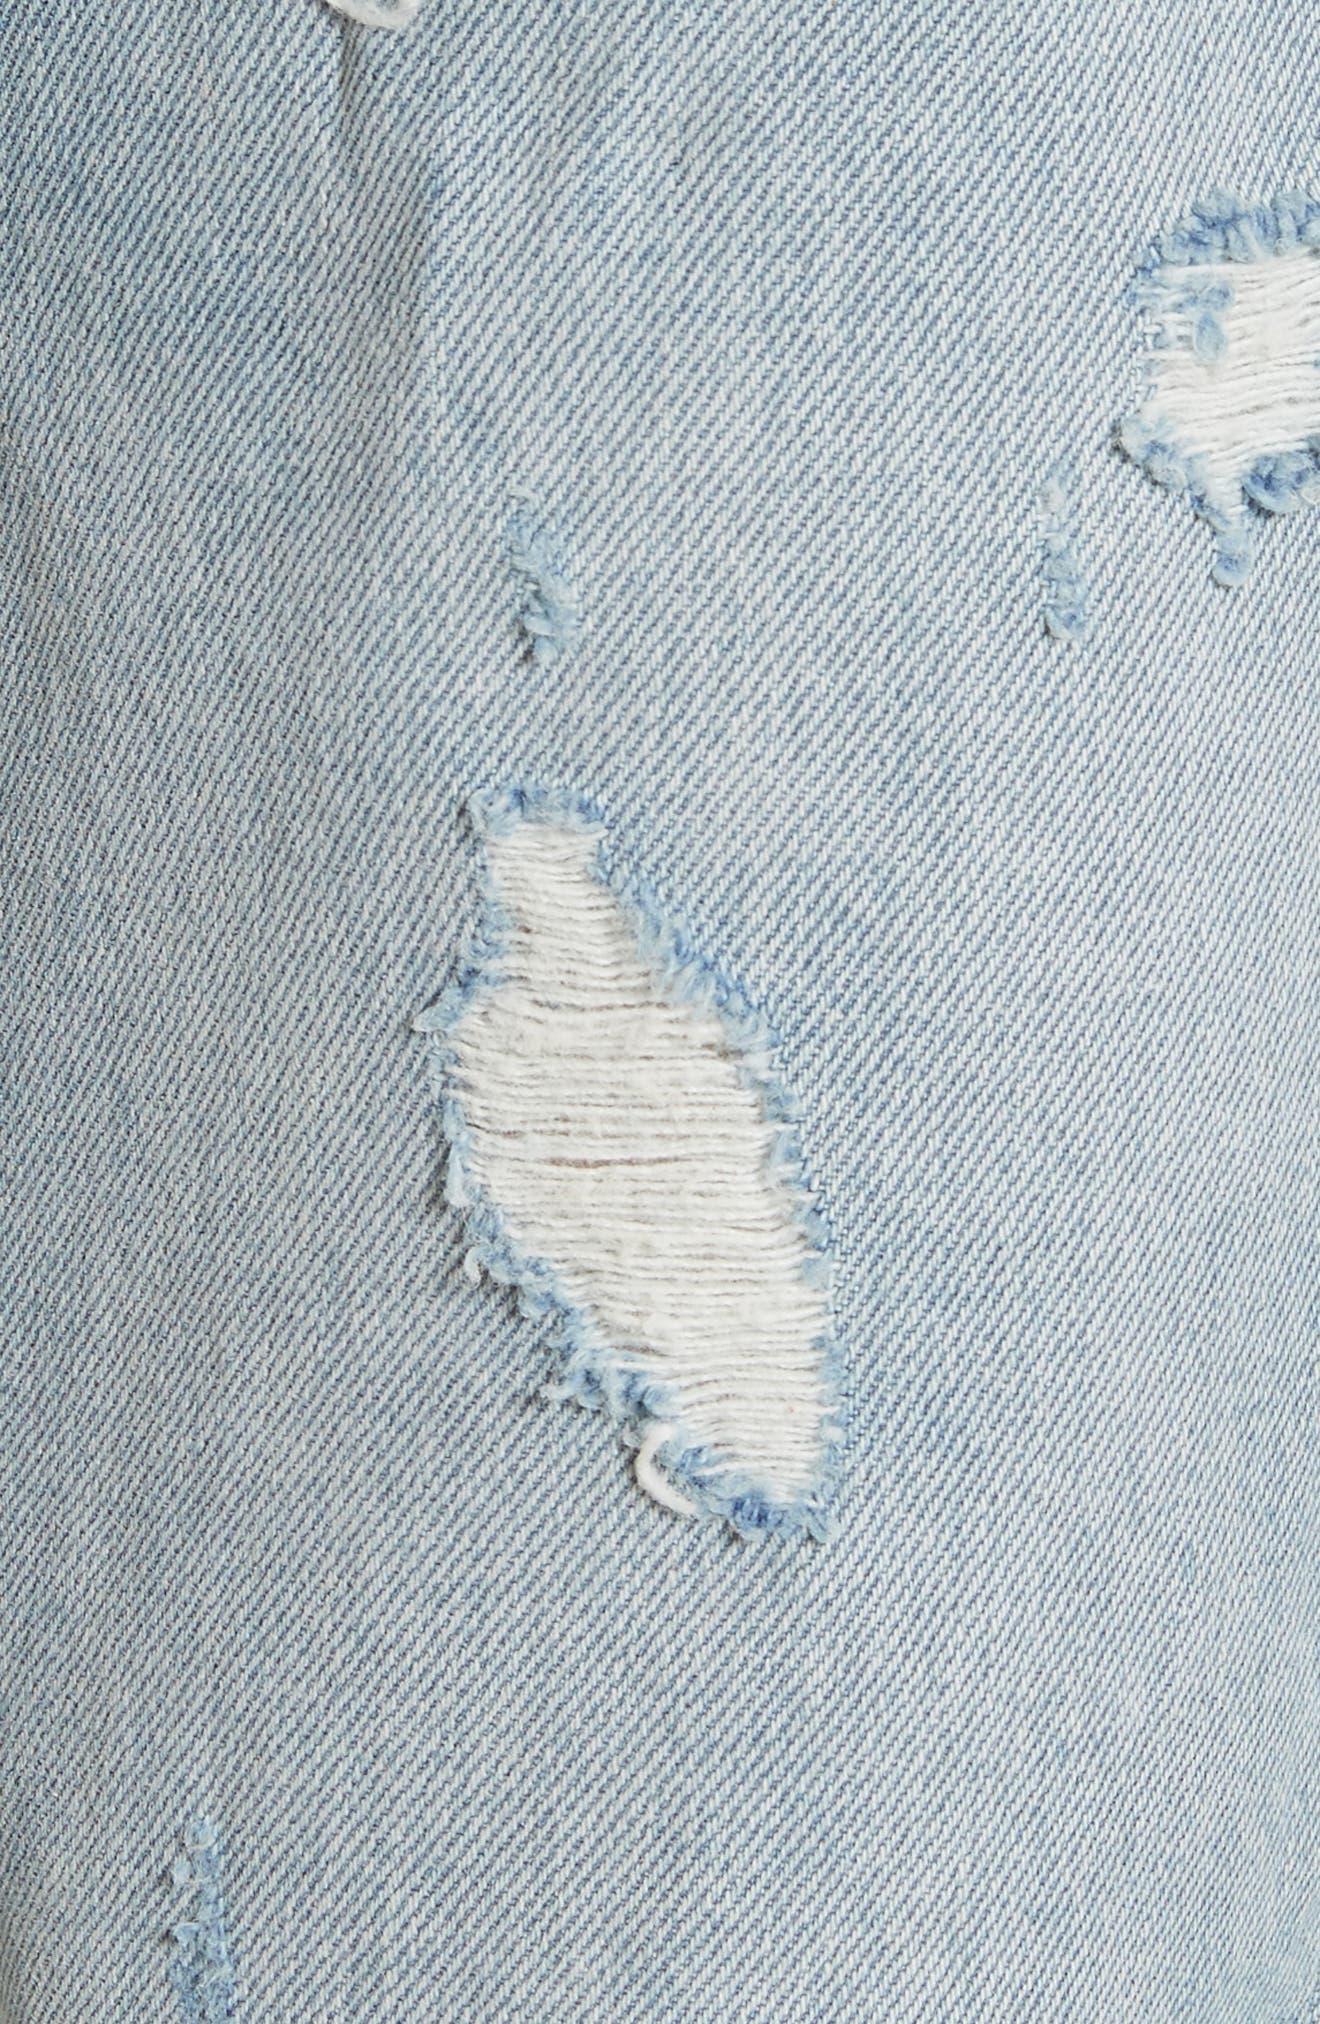 Alternate Image 5  - GRLFRND Helena Ripped Rigid High Waist Straight Jeans (Reese)